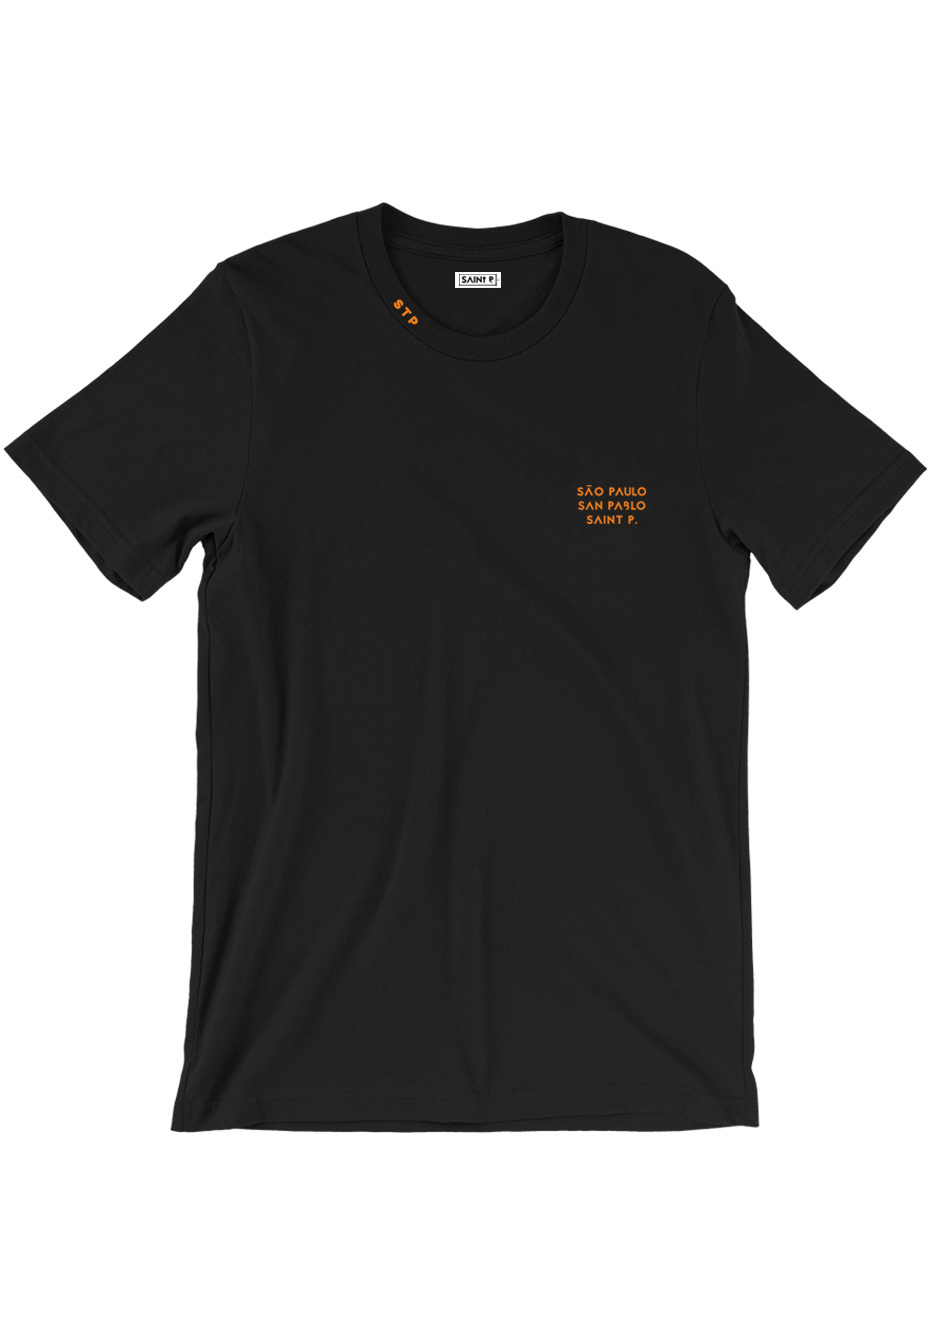 Camiseta Masculina San Pablo - Saint P